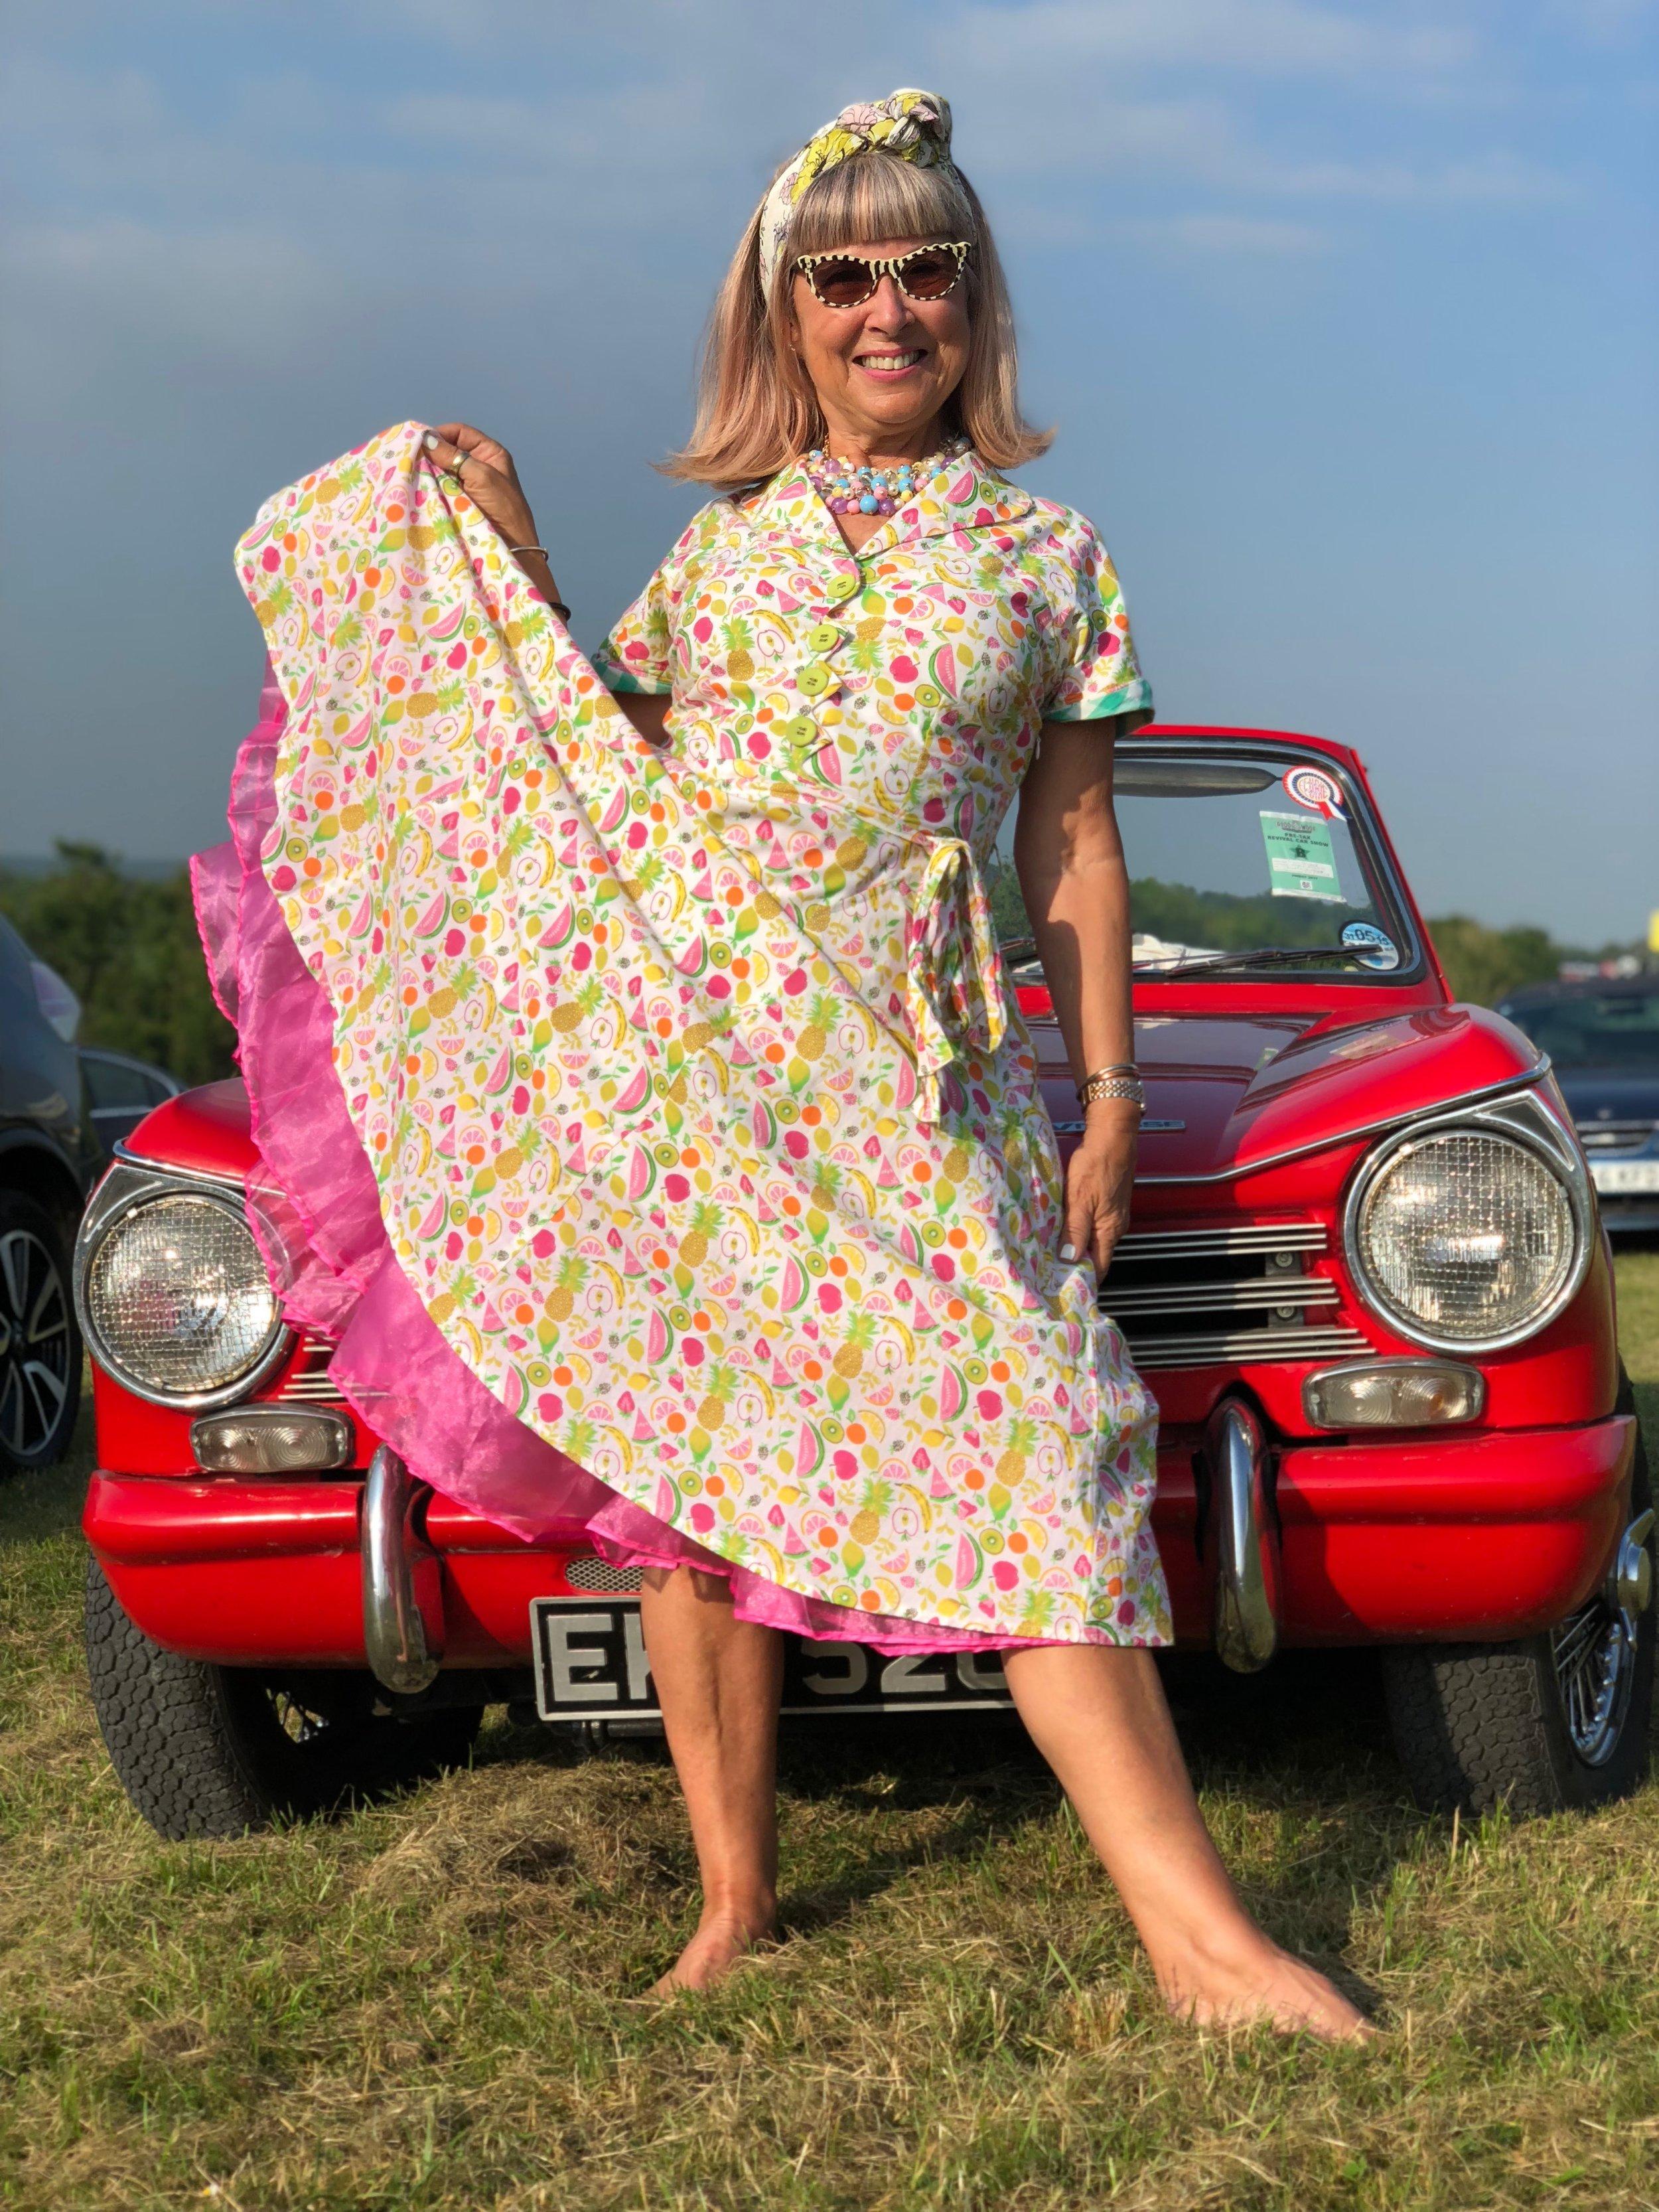 retro 50s dress with vintage car